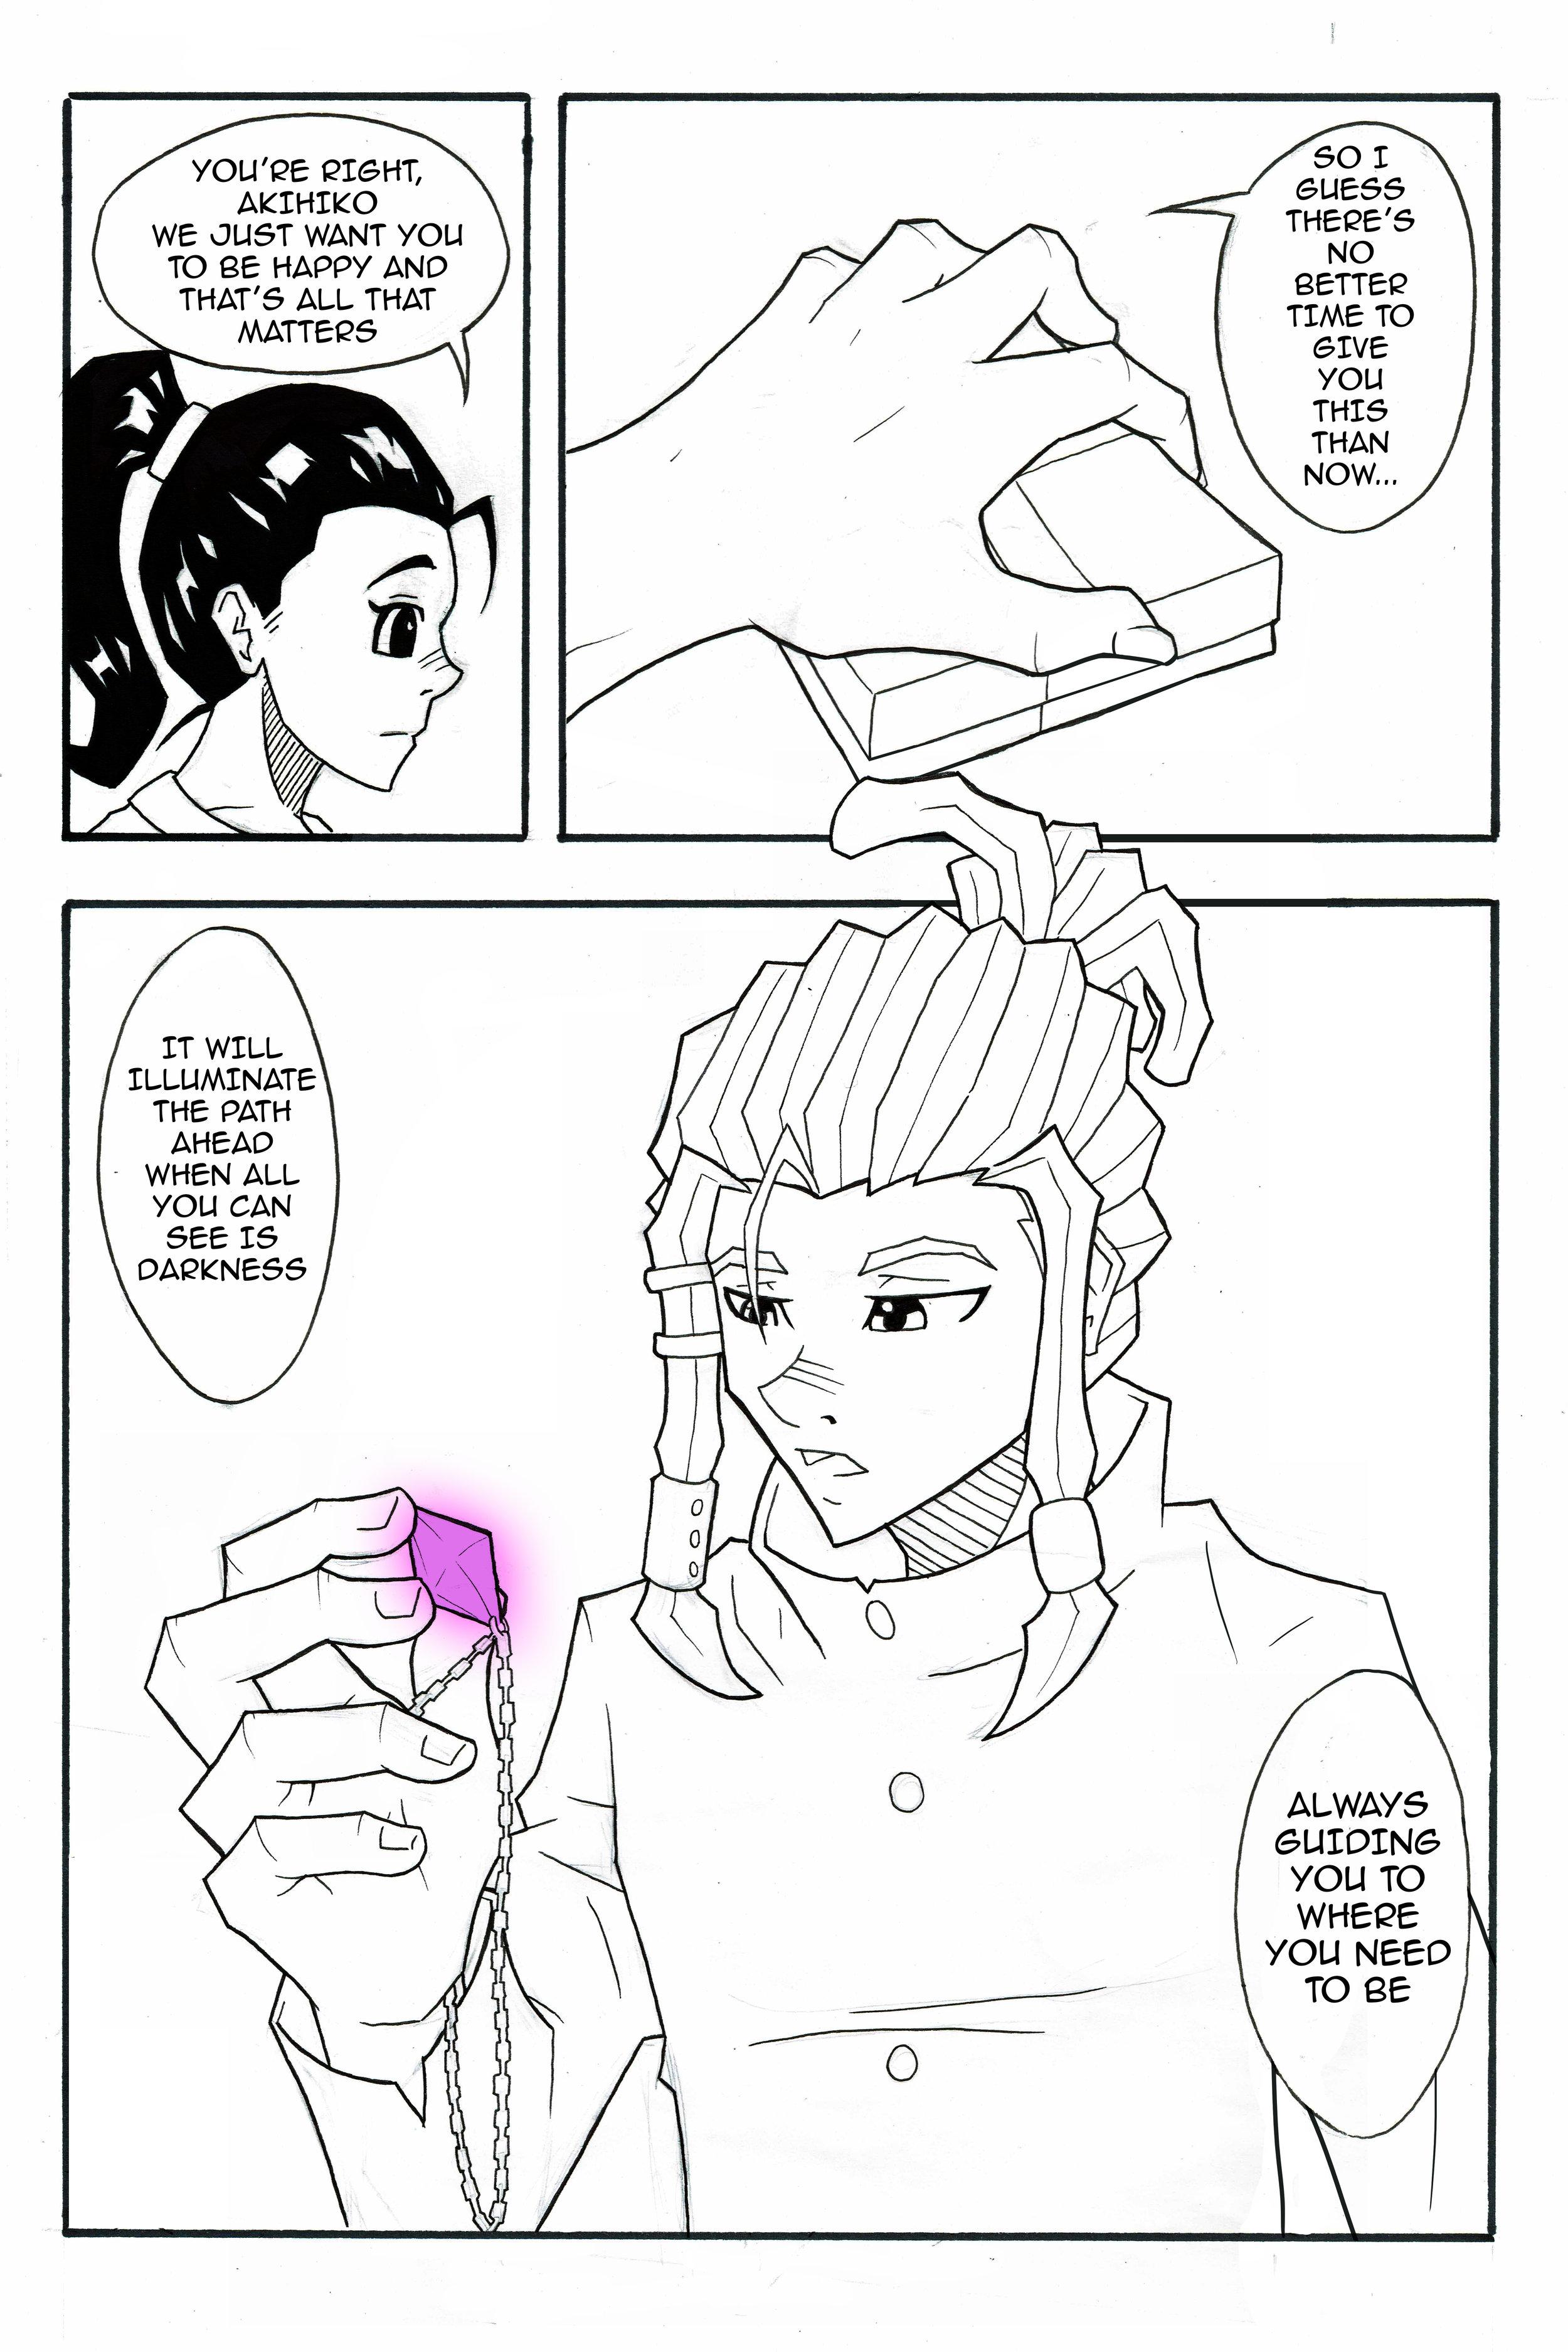 C1 PAGE 9.jpg